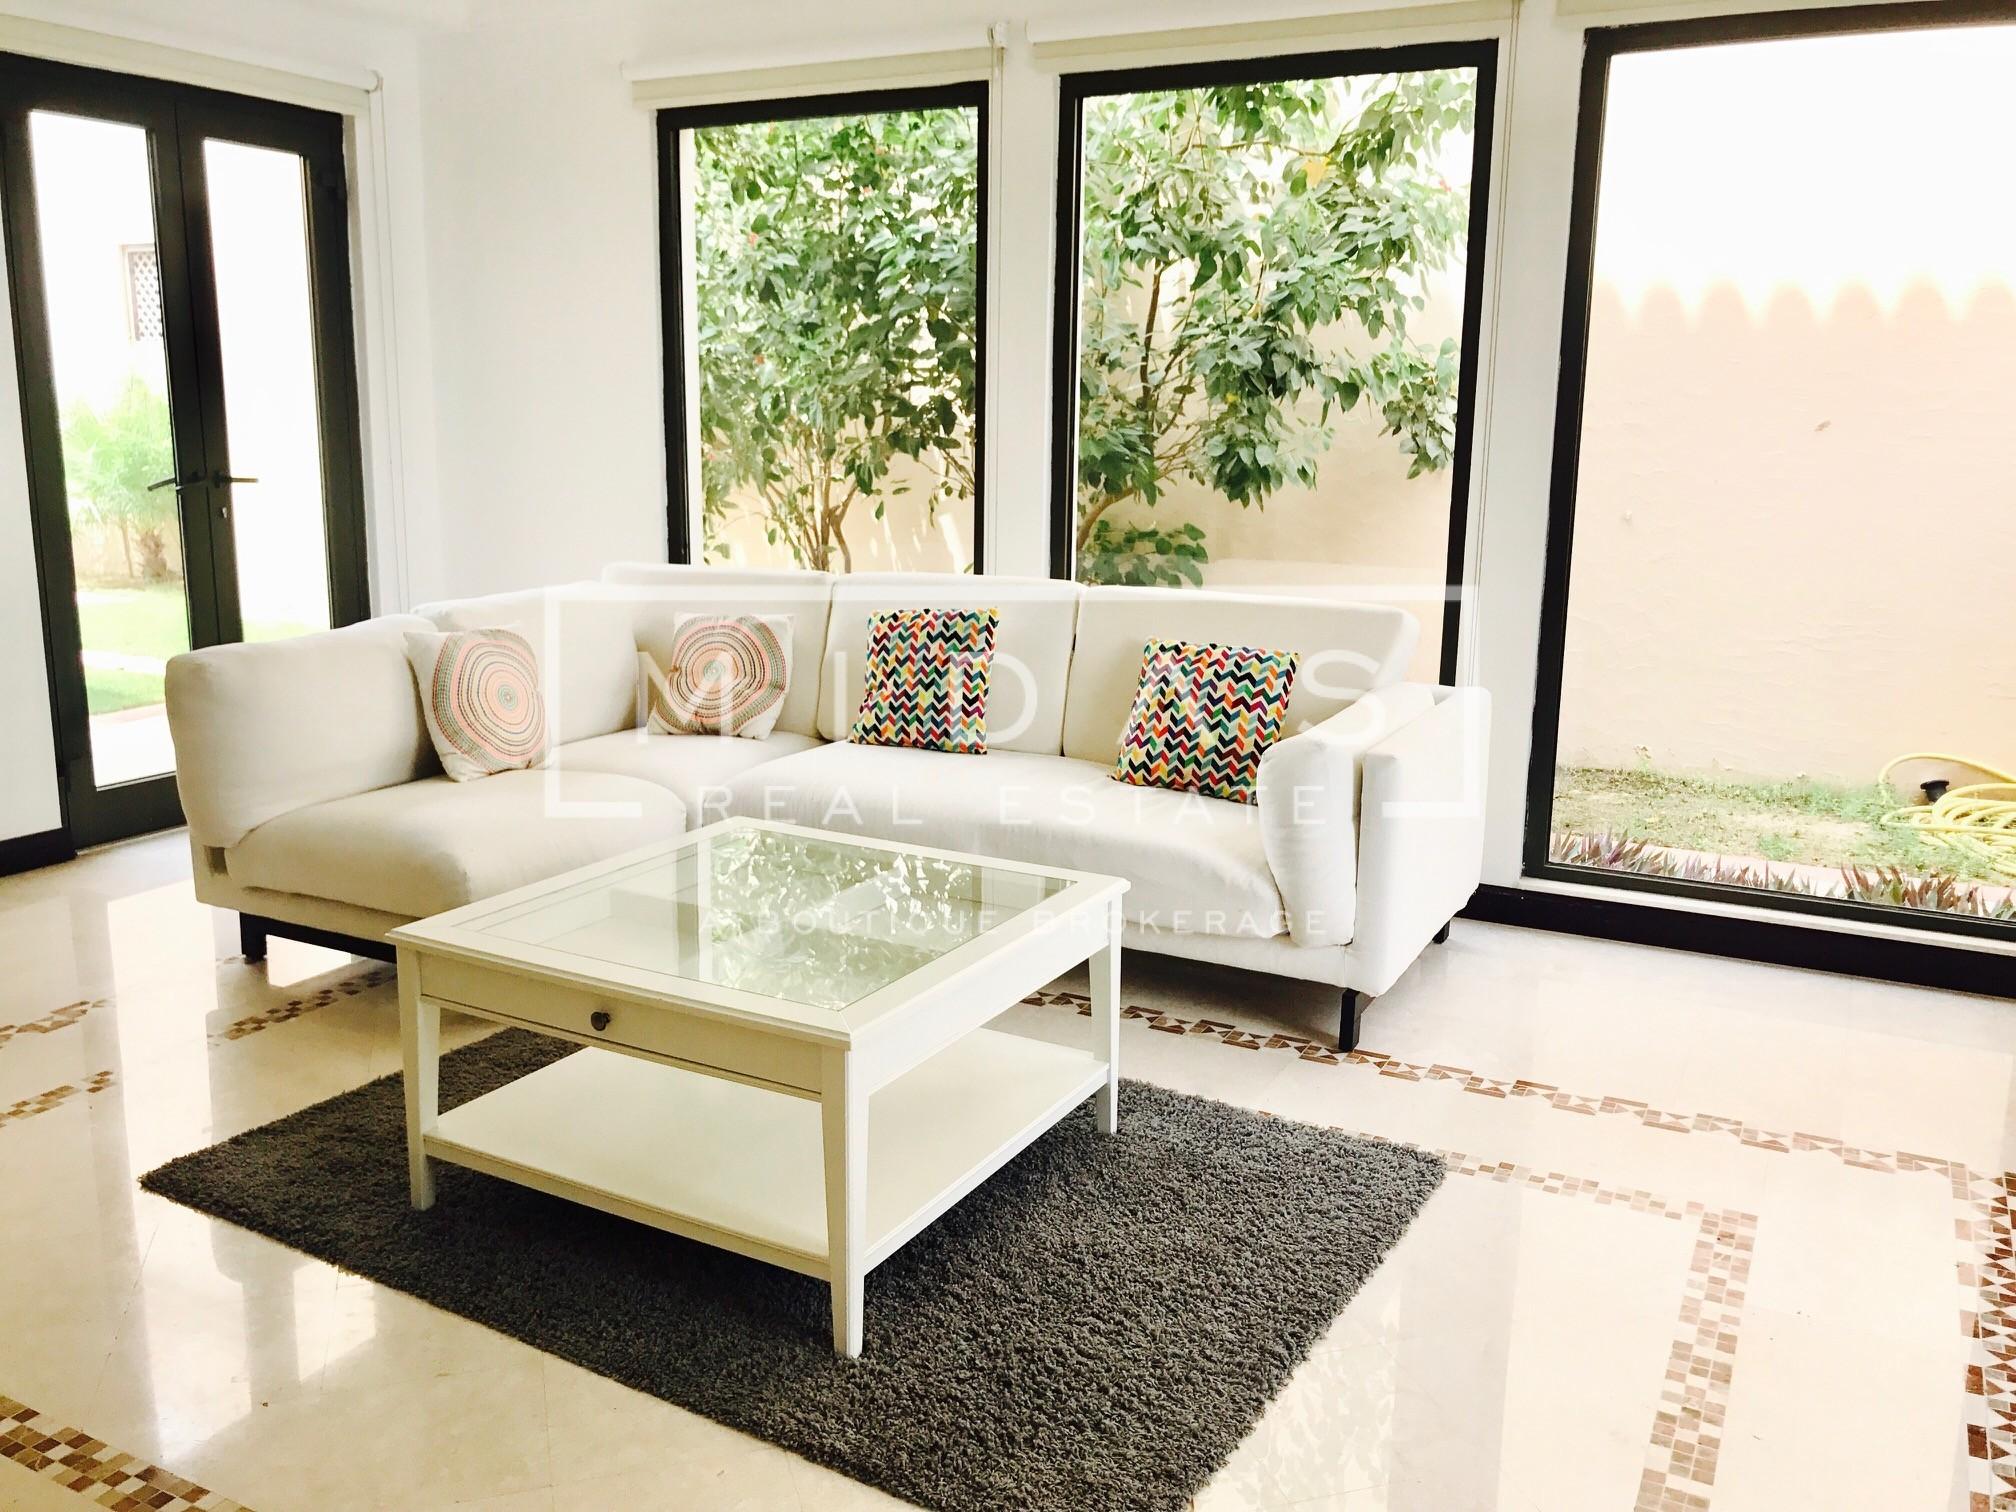 Stunning 5BR Villa in Garden Home L Frond Palm Jumeirah